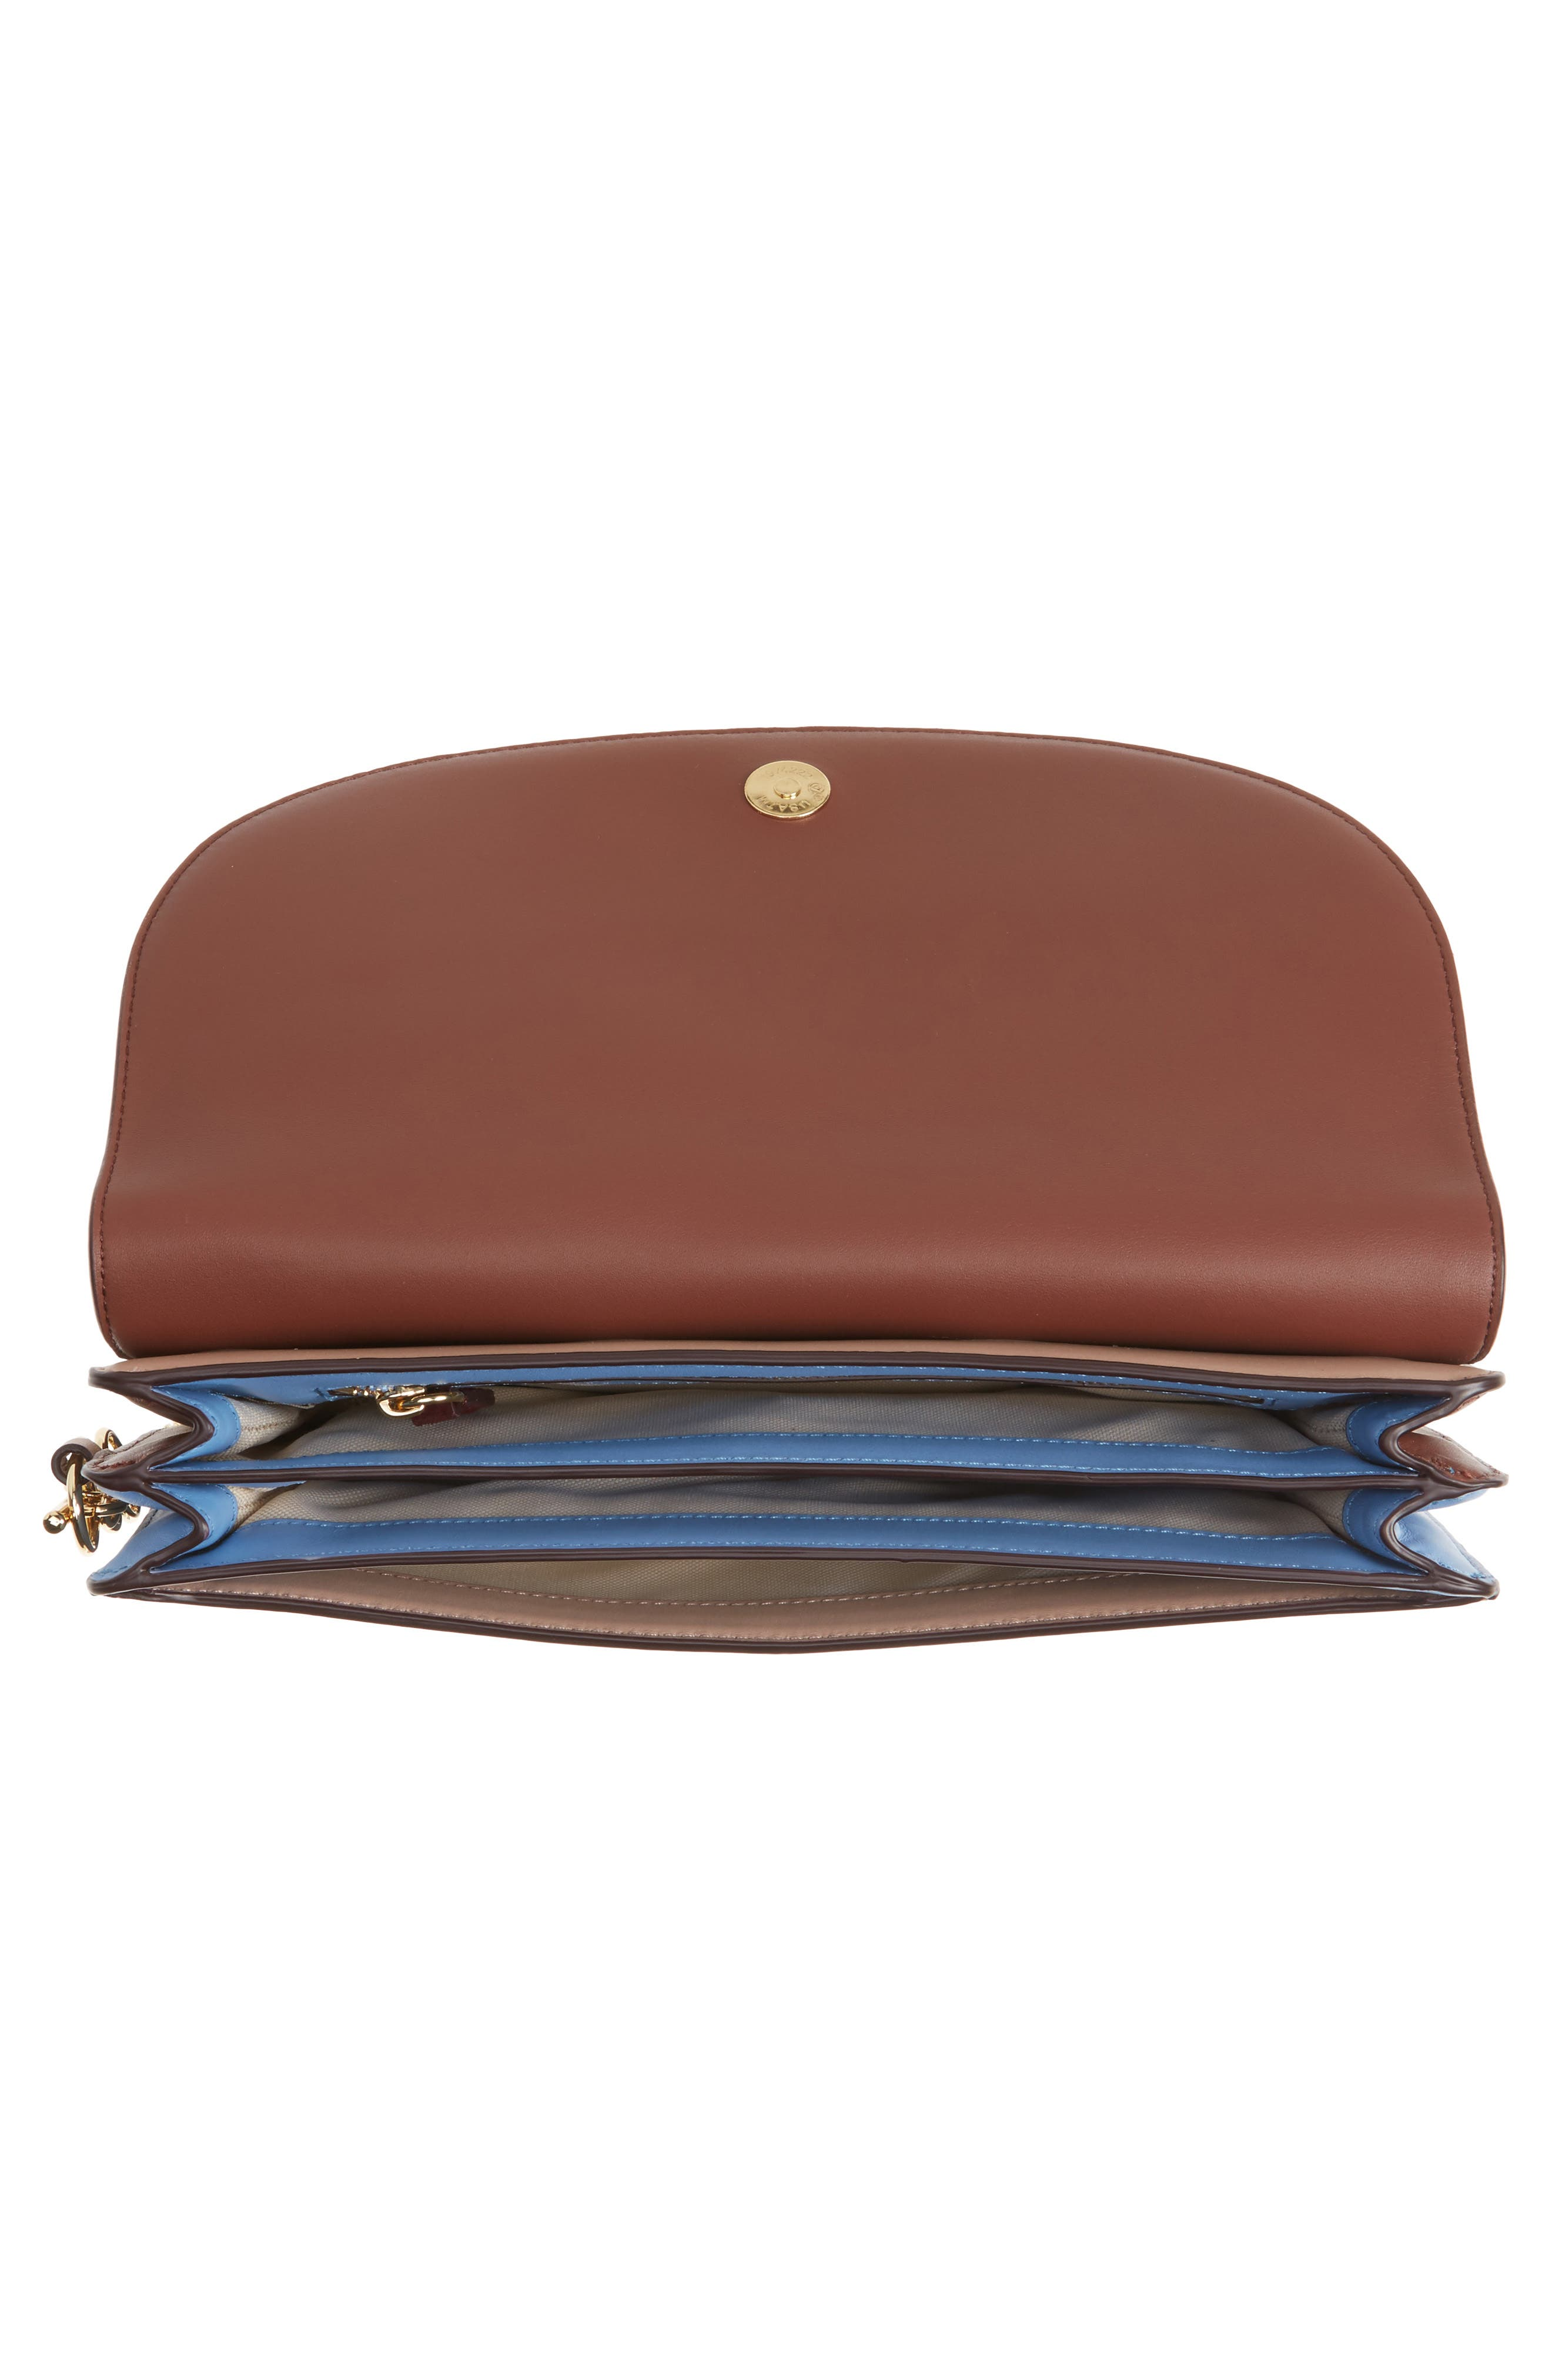 Convertible Leather Saddle Clutch,                             Alternate thumbnail 4, color,                             Bordeaux/ Dusty Pink